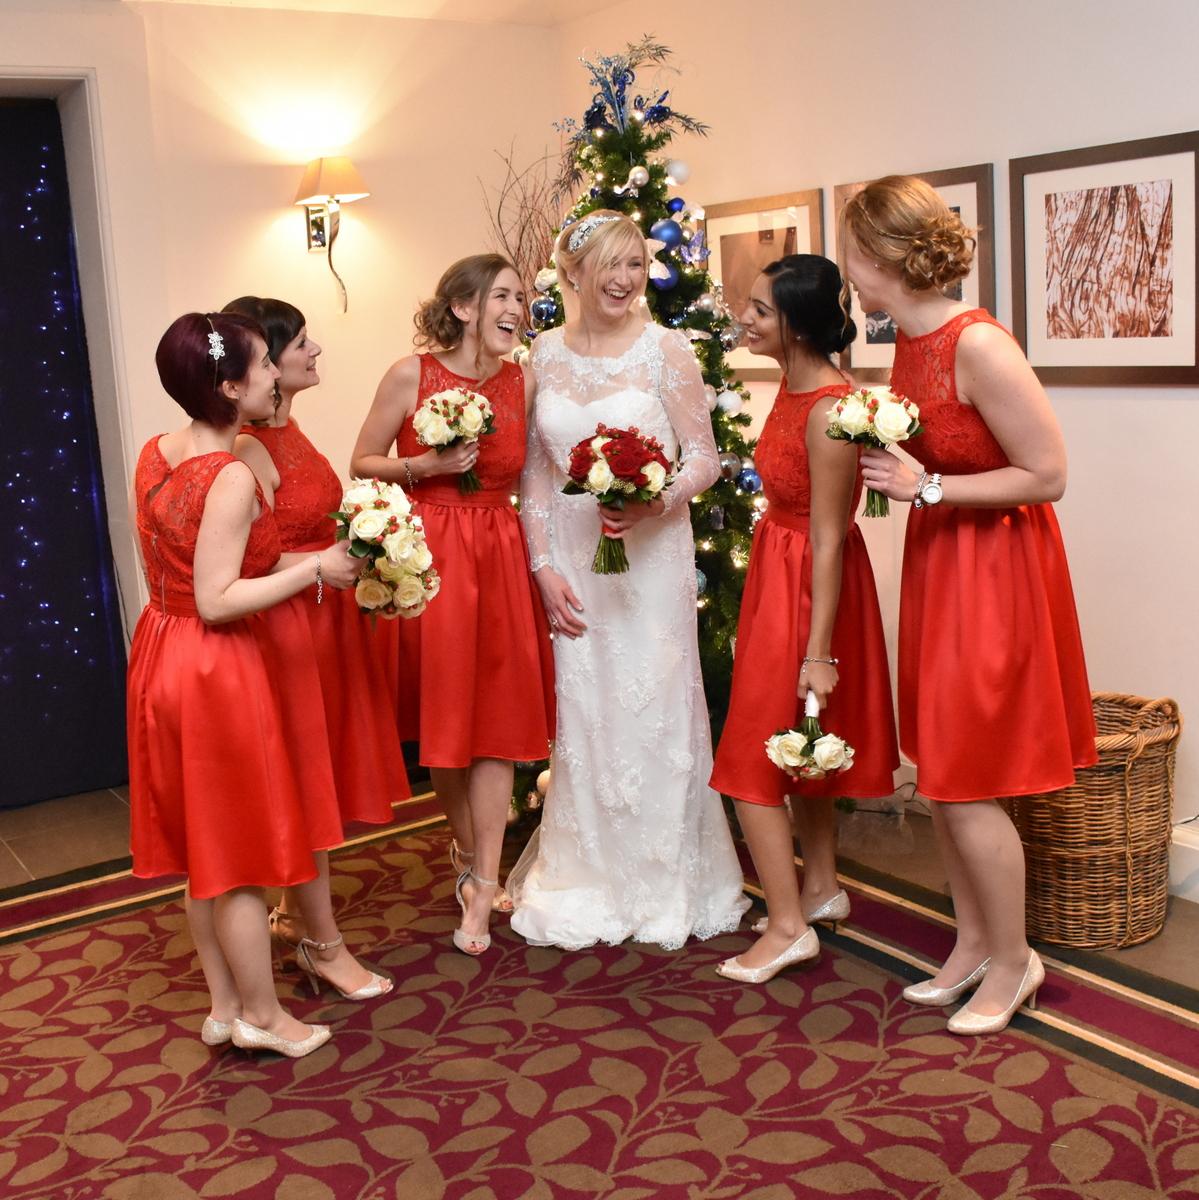 Hampshire Wedding Photography - 2015 highlights 105